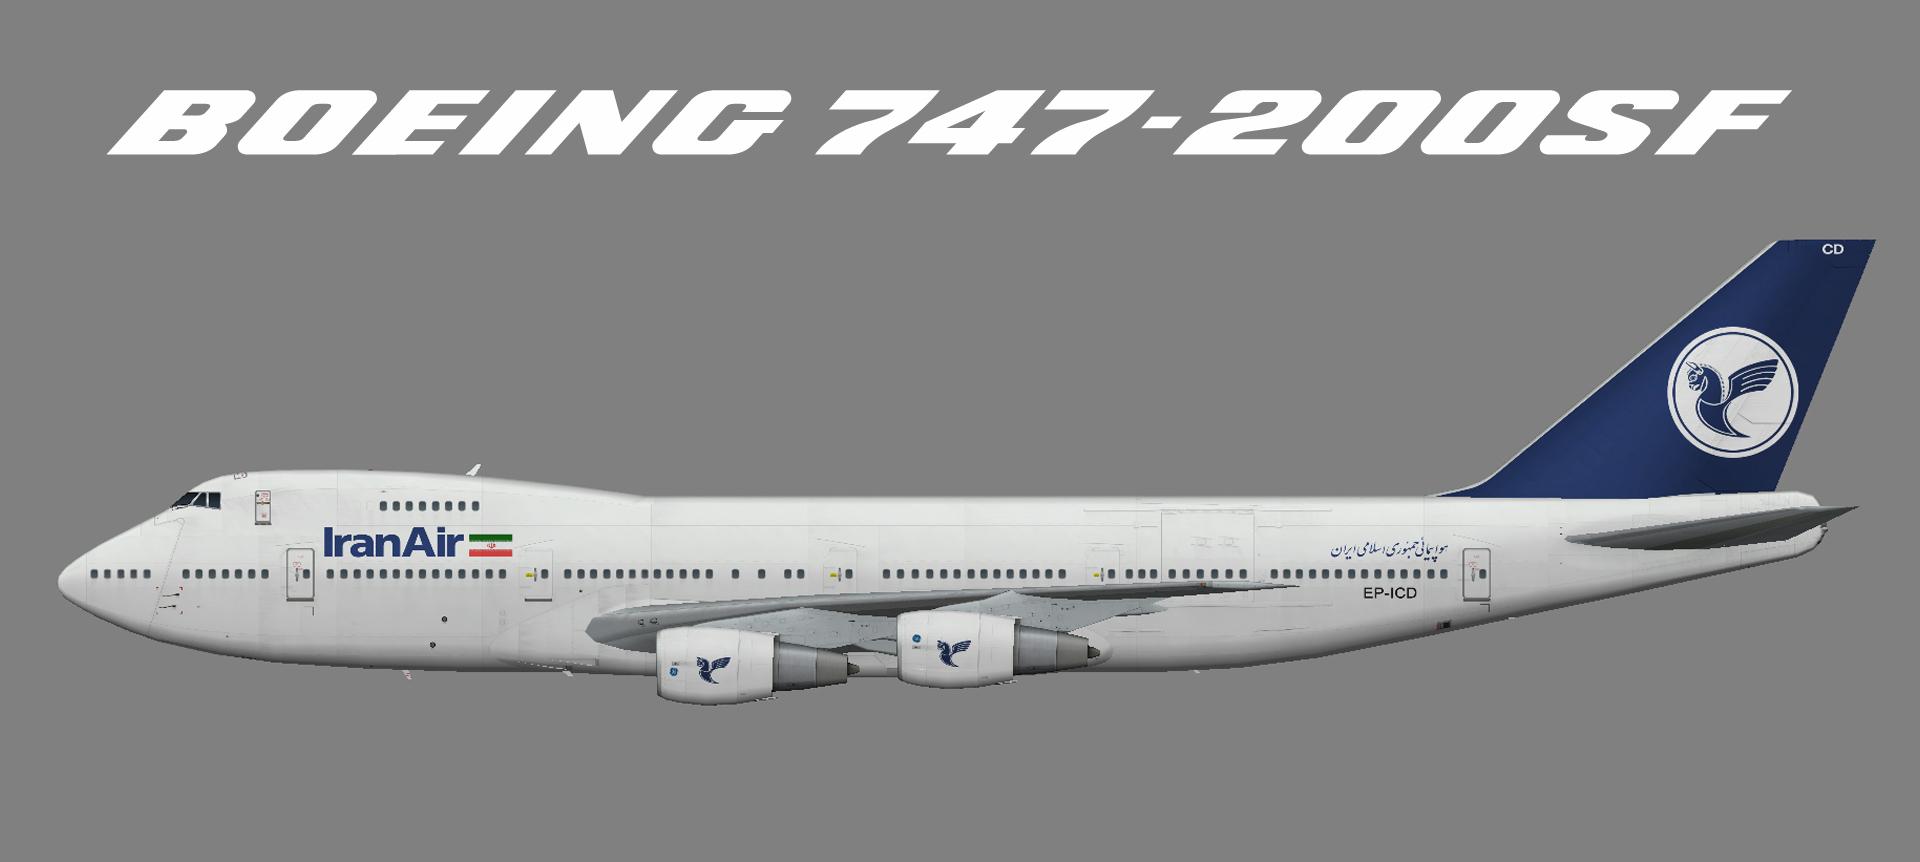 Iran Air Cargo Boeing 747-200F